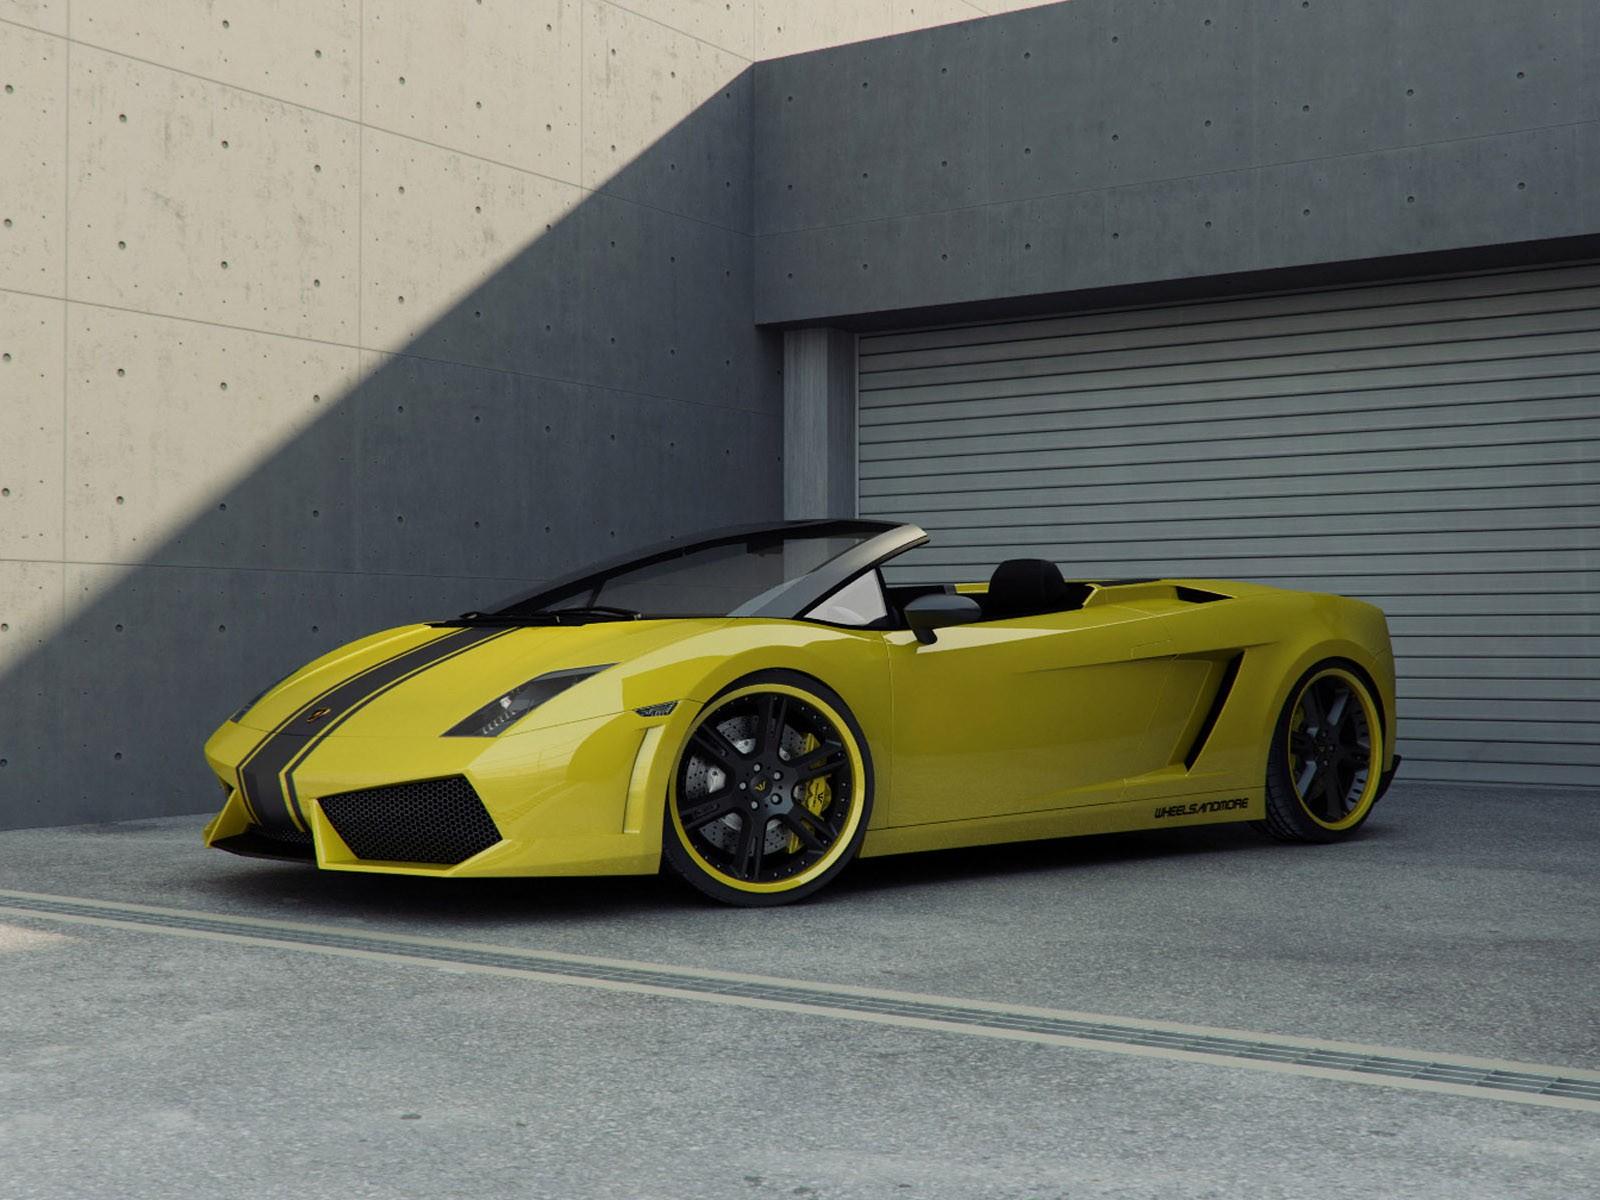 2009 Wheelsandmore Lamborghini Gallardo Spyder